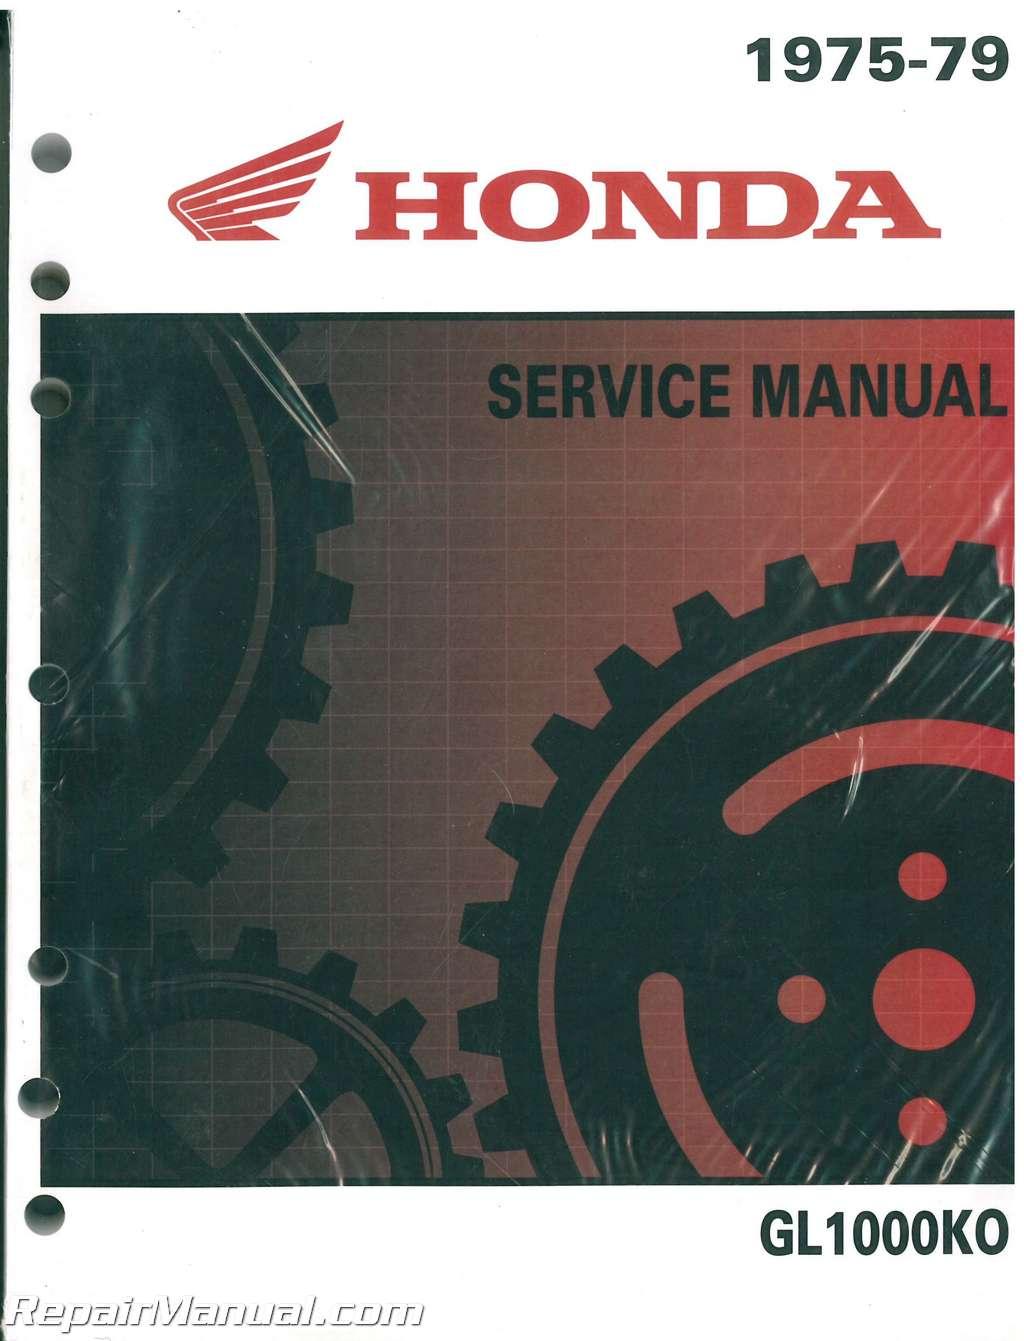 Honda Goldwing Wiring Diagram On 1978 Honda Gl 1000 On Gl1000